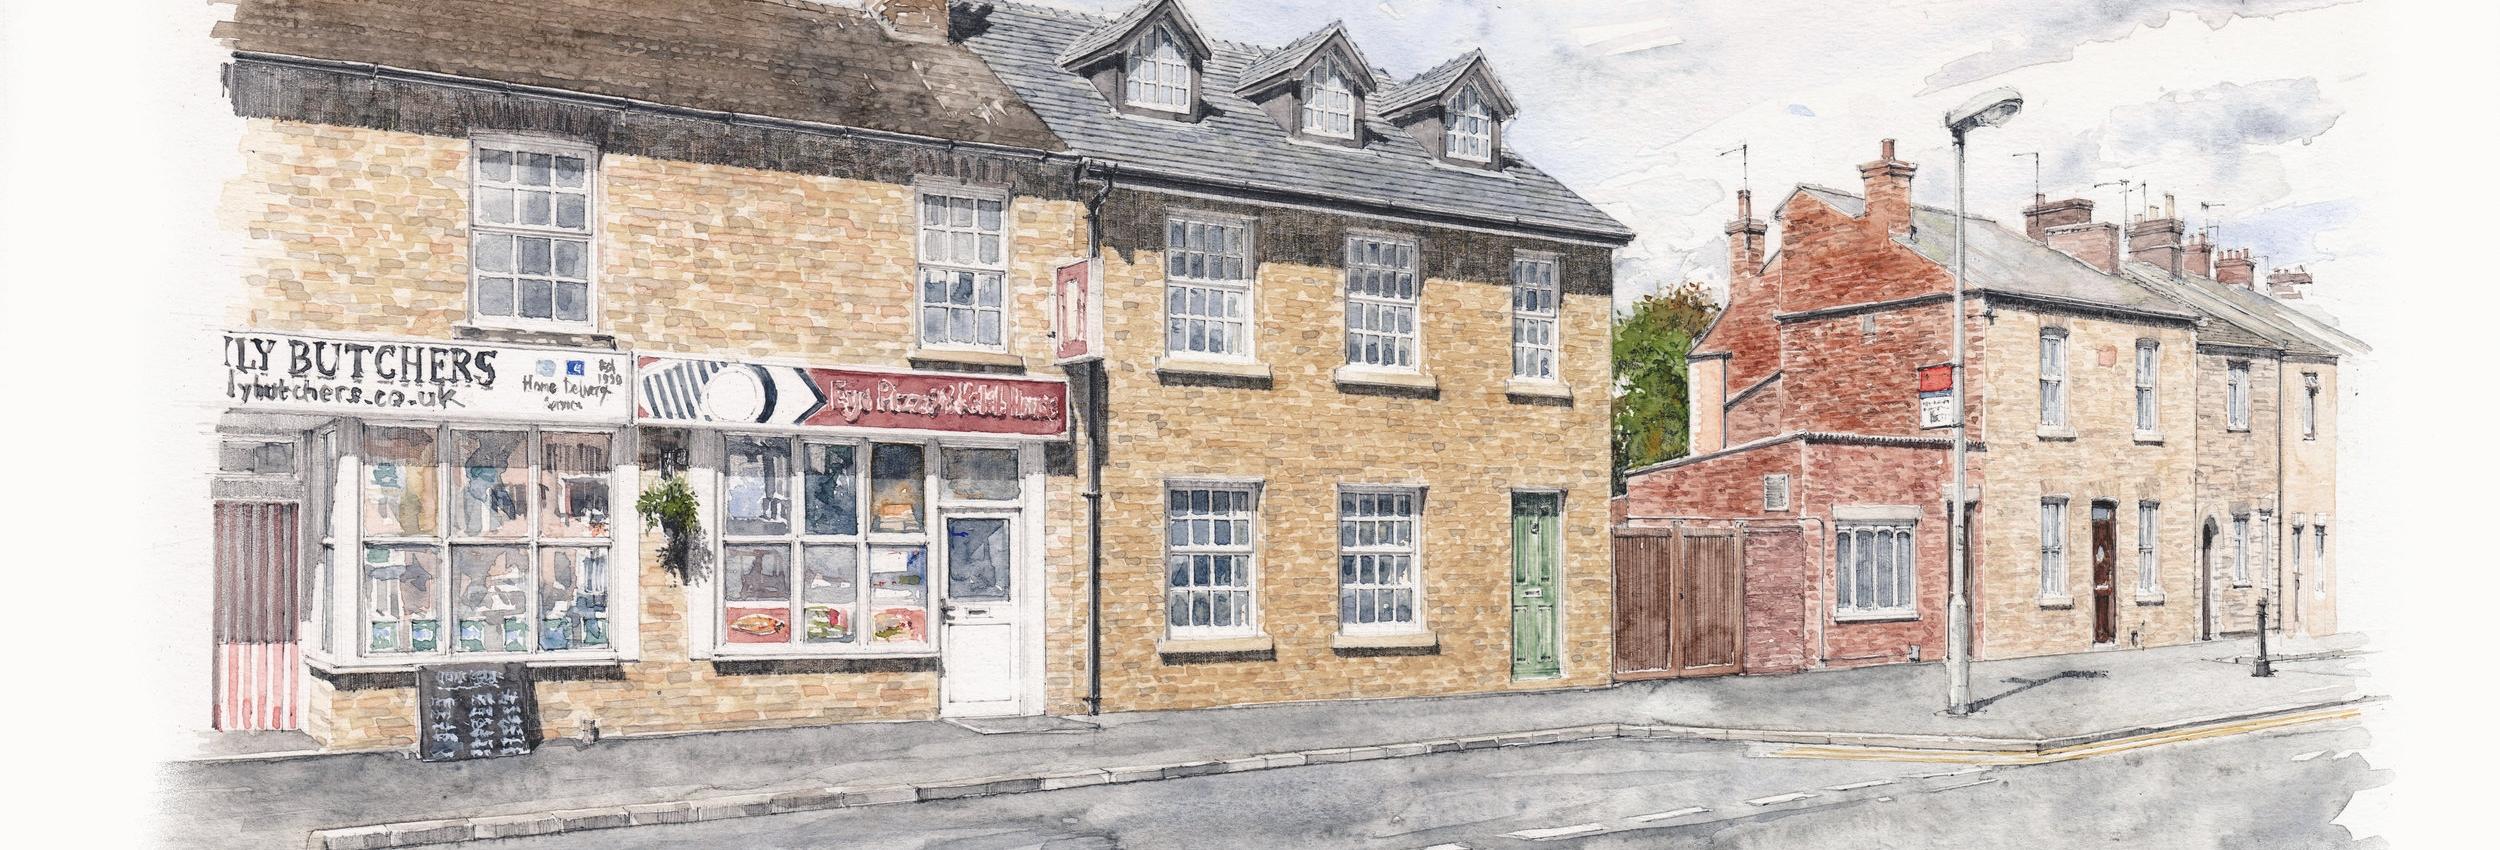 16215 High Street, Eye, Peterborough 01.jpg